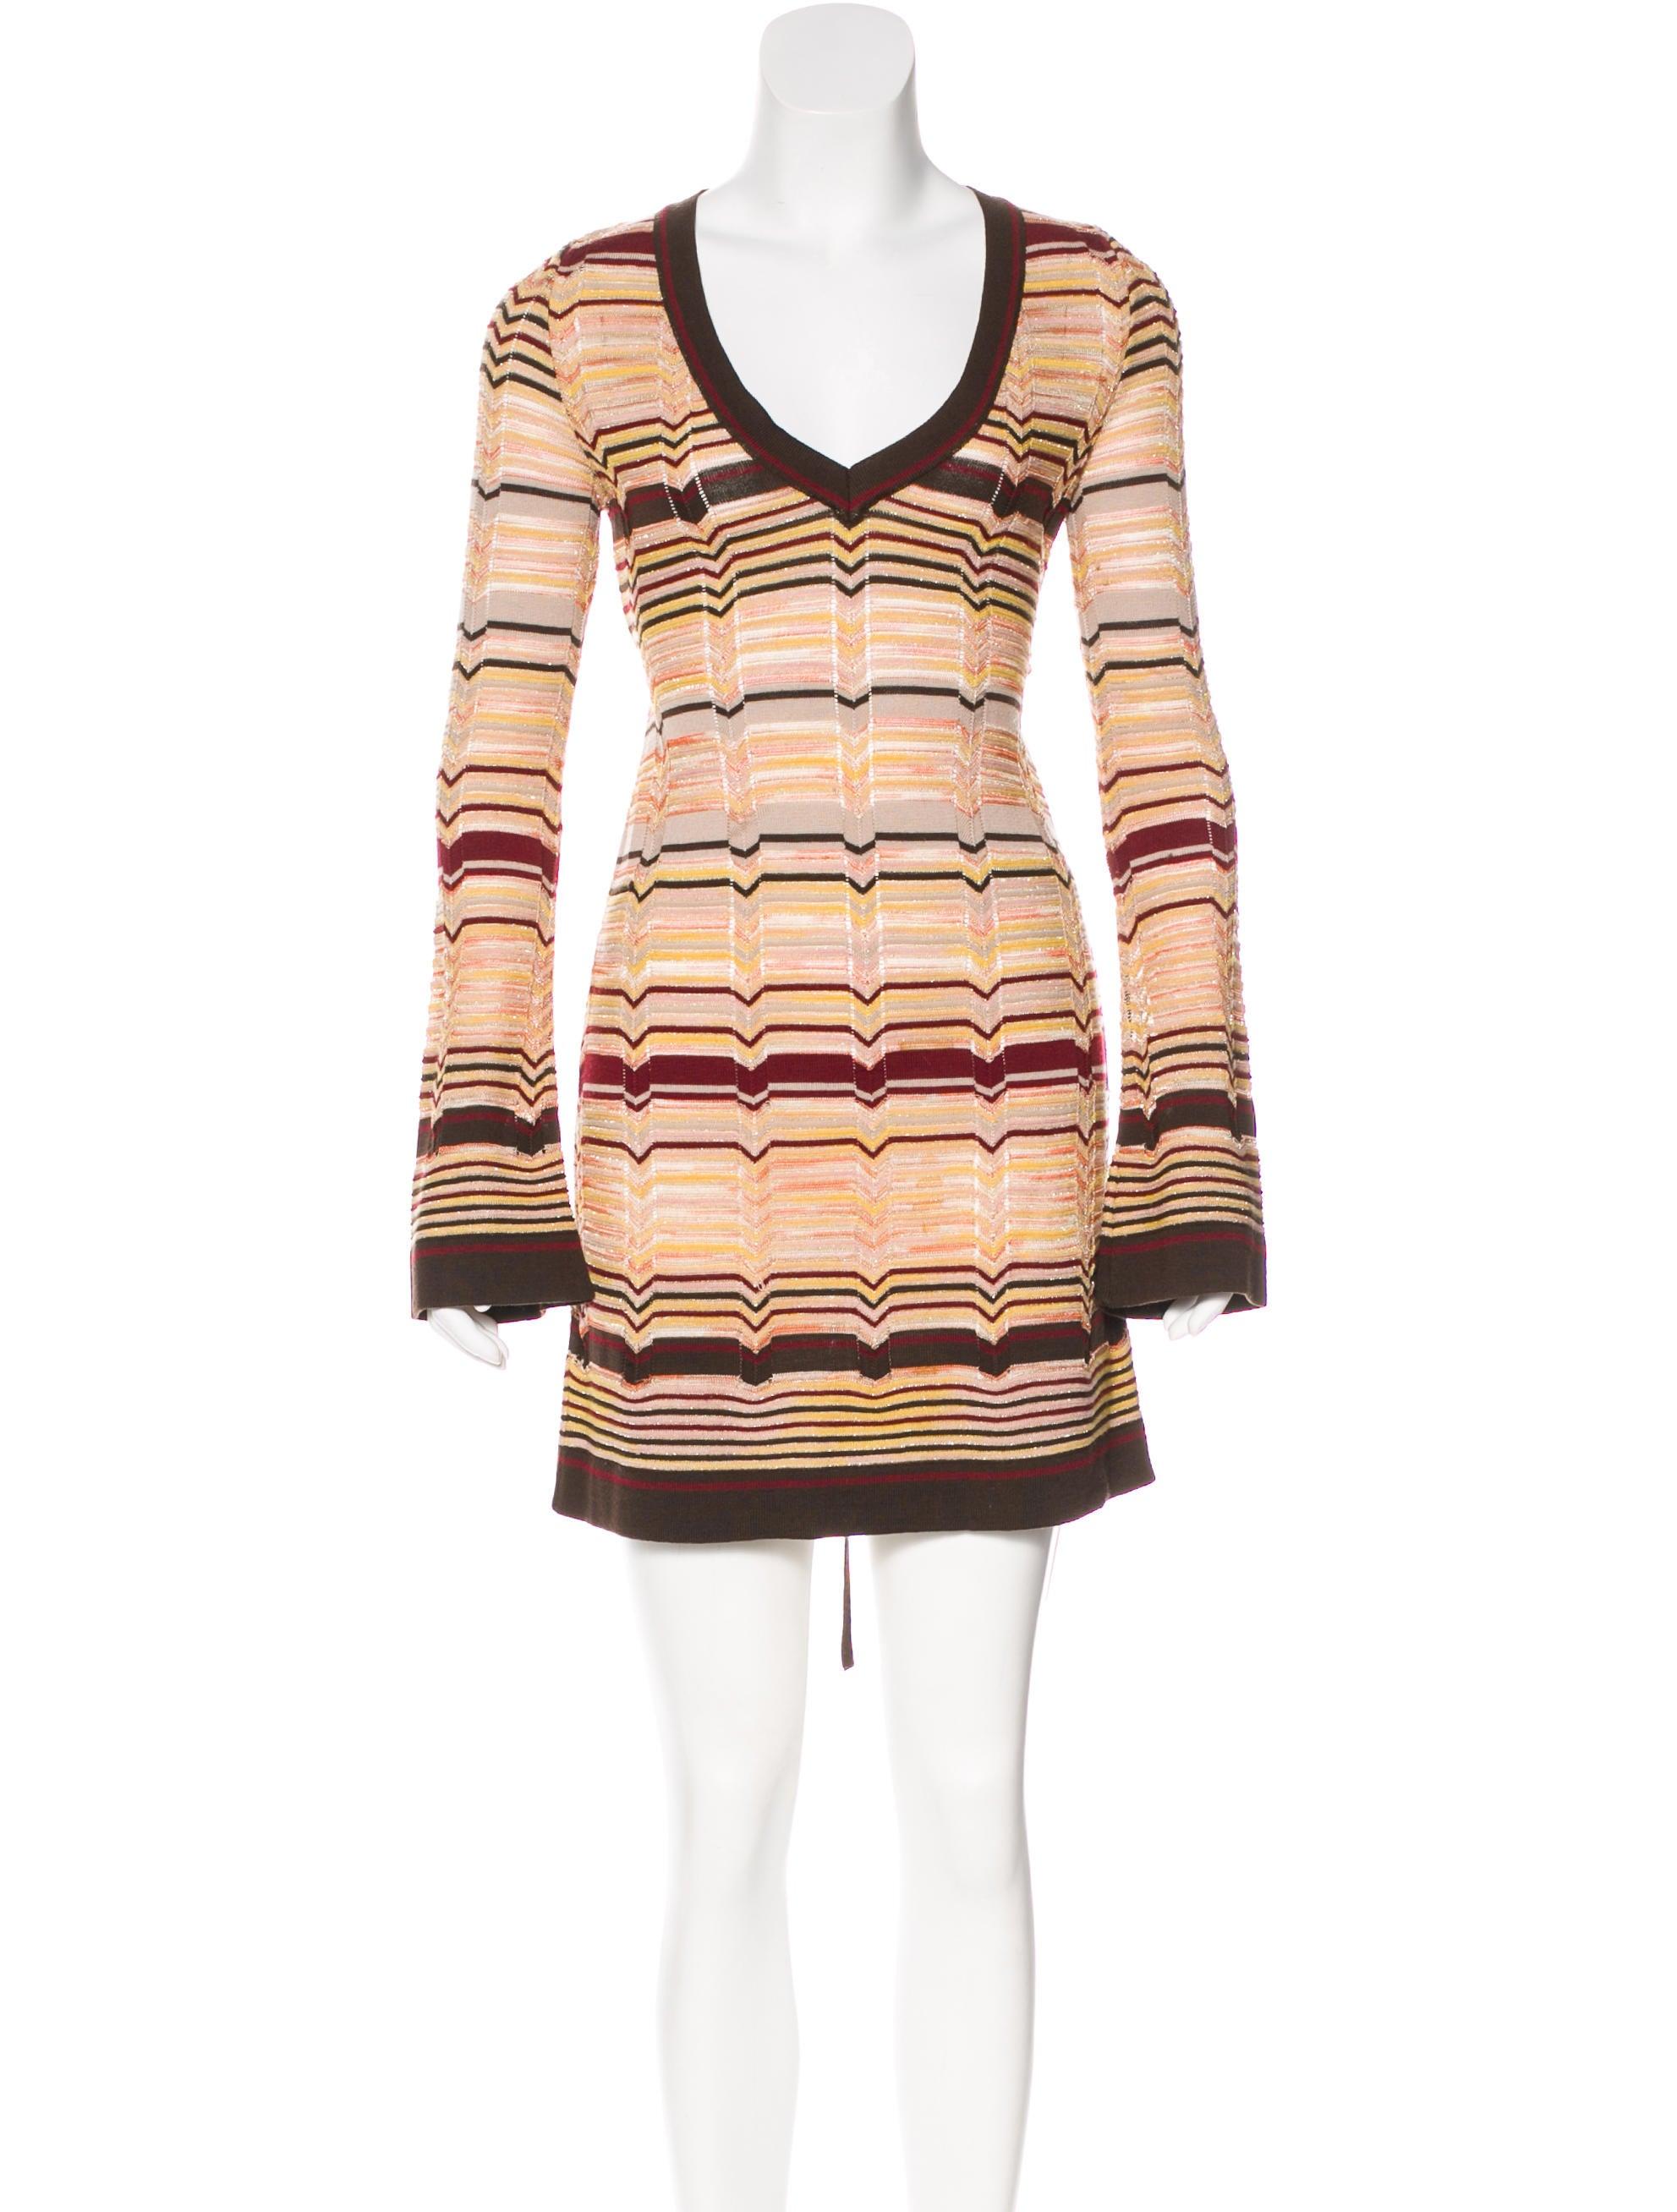 64fa8eec17322 M Missoni Metallic Wool Dress - Clothing - WM444458 | The RealReal